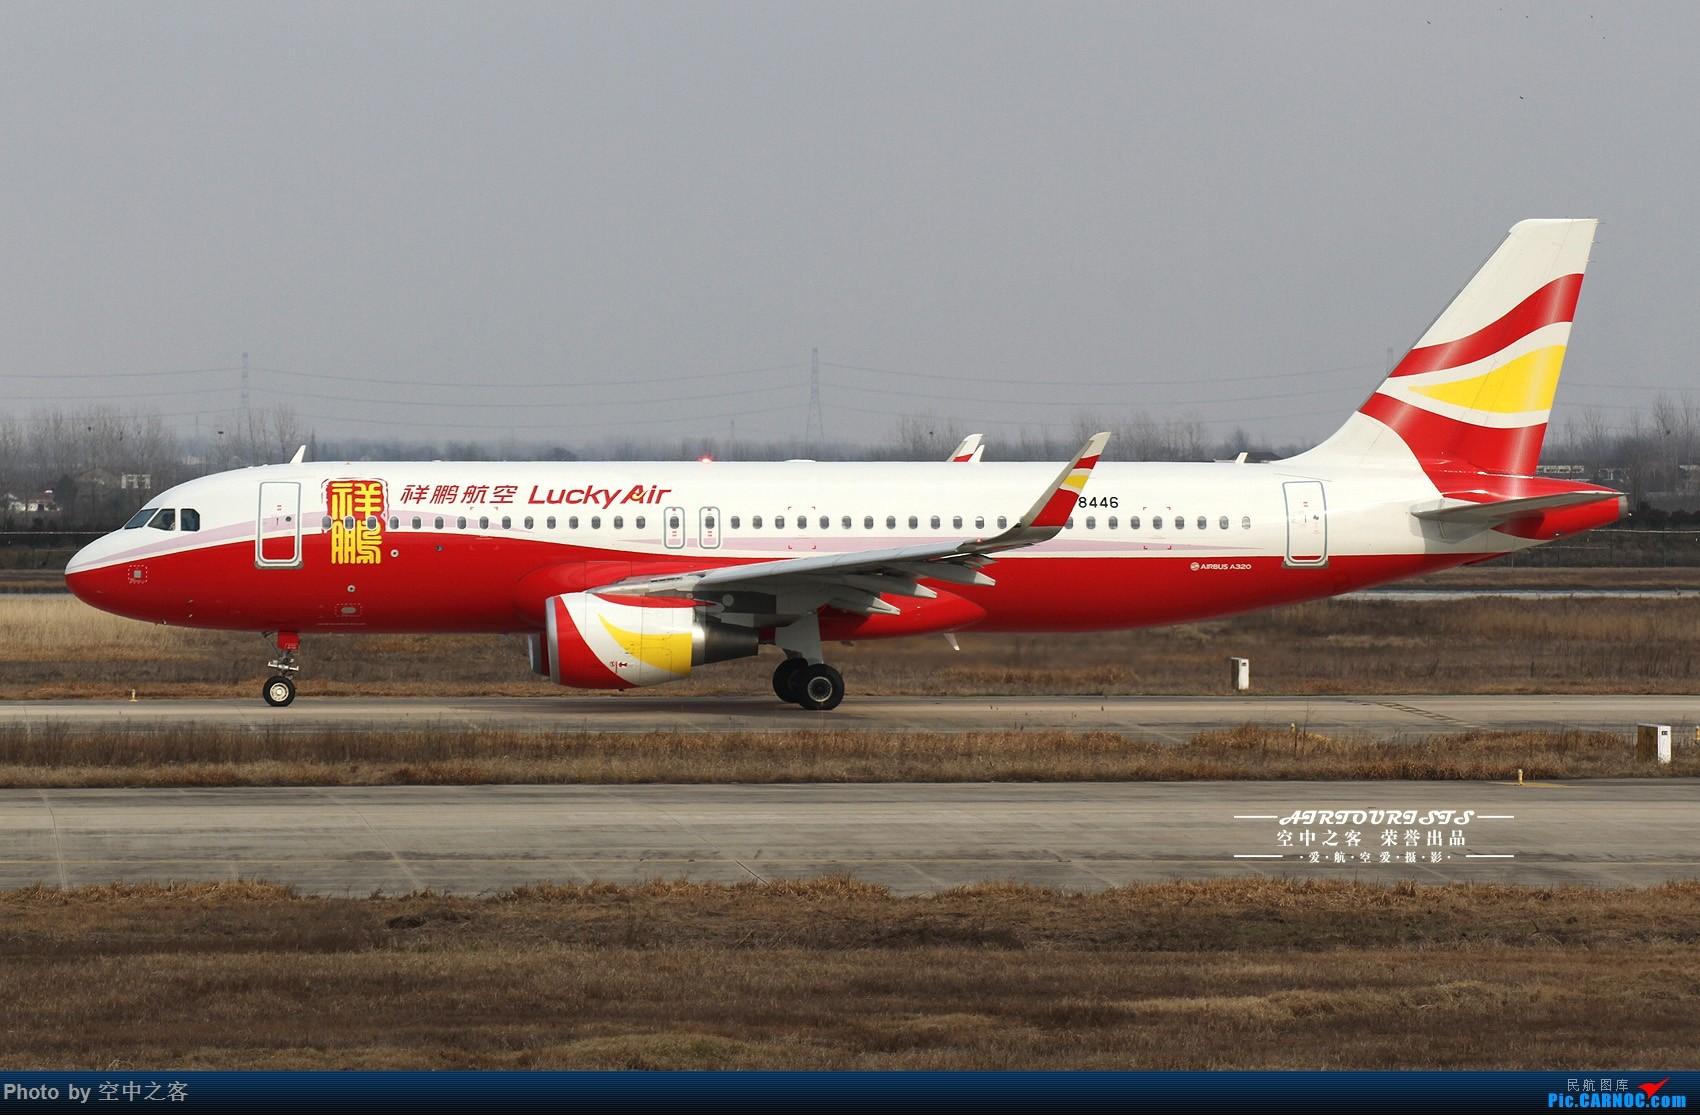 Re:[原创][合肥飞友会·霸都打机队·空中之客出品]有一只狮子有一只蒙牛...魔头大佬亲临新机场 AIRBUS A320-200 B-8446 合肥新桥国际机场